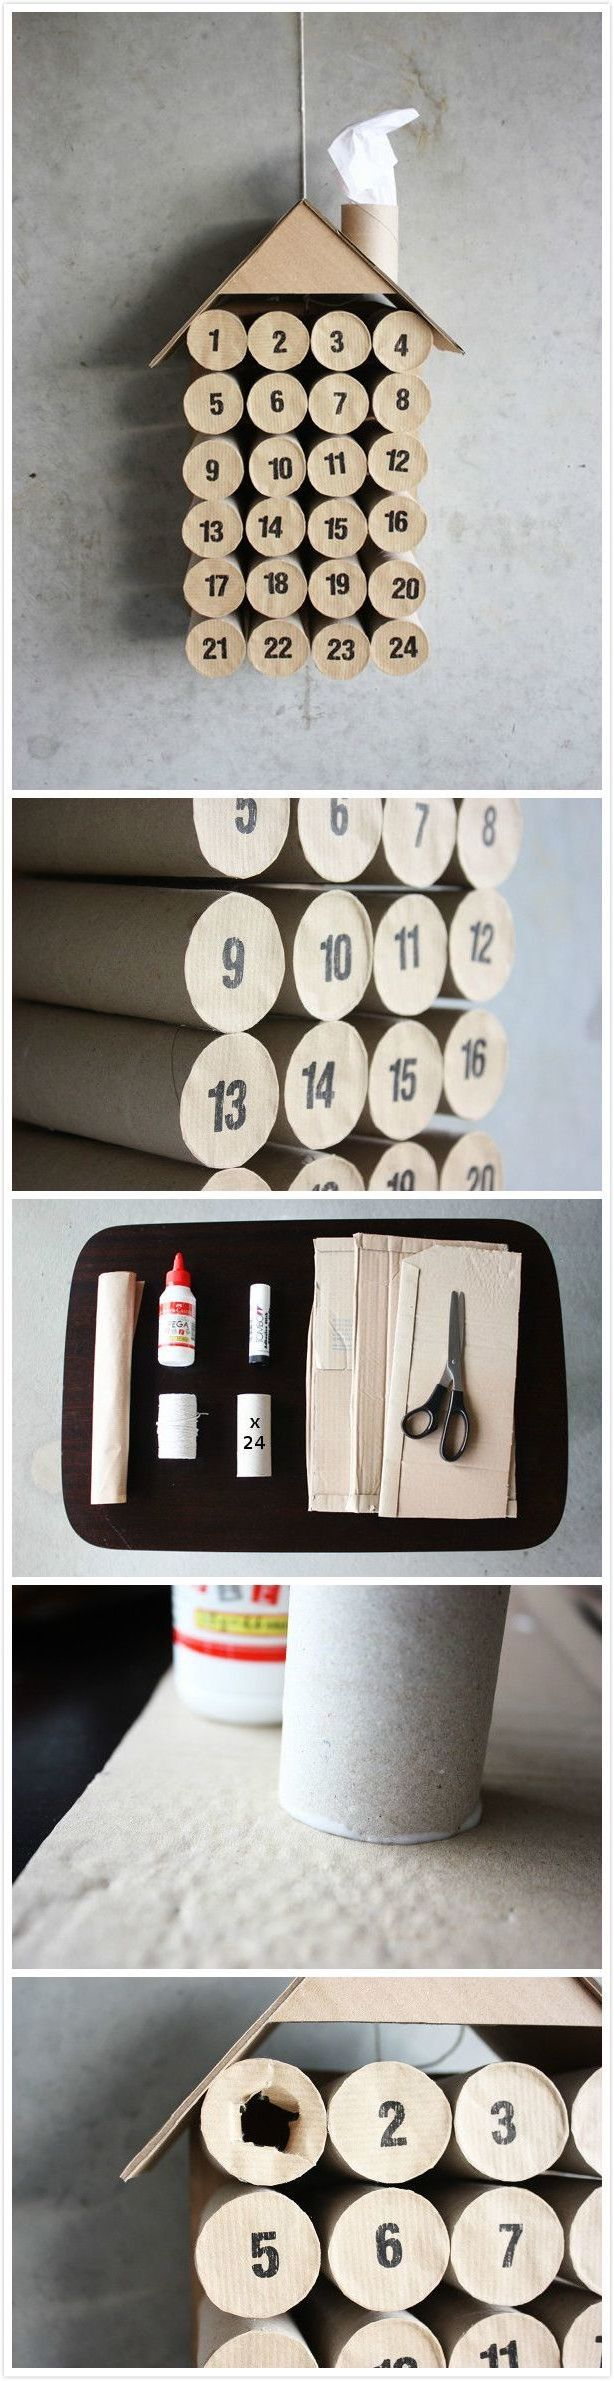 basteln mit klopapierrollen 38 diy anleitungen f r jeden anlass bastelideen diy zenideen. Black Bedroom Furniture Sets. Home Design Ideas